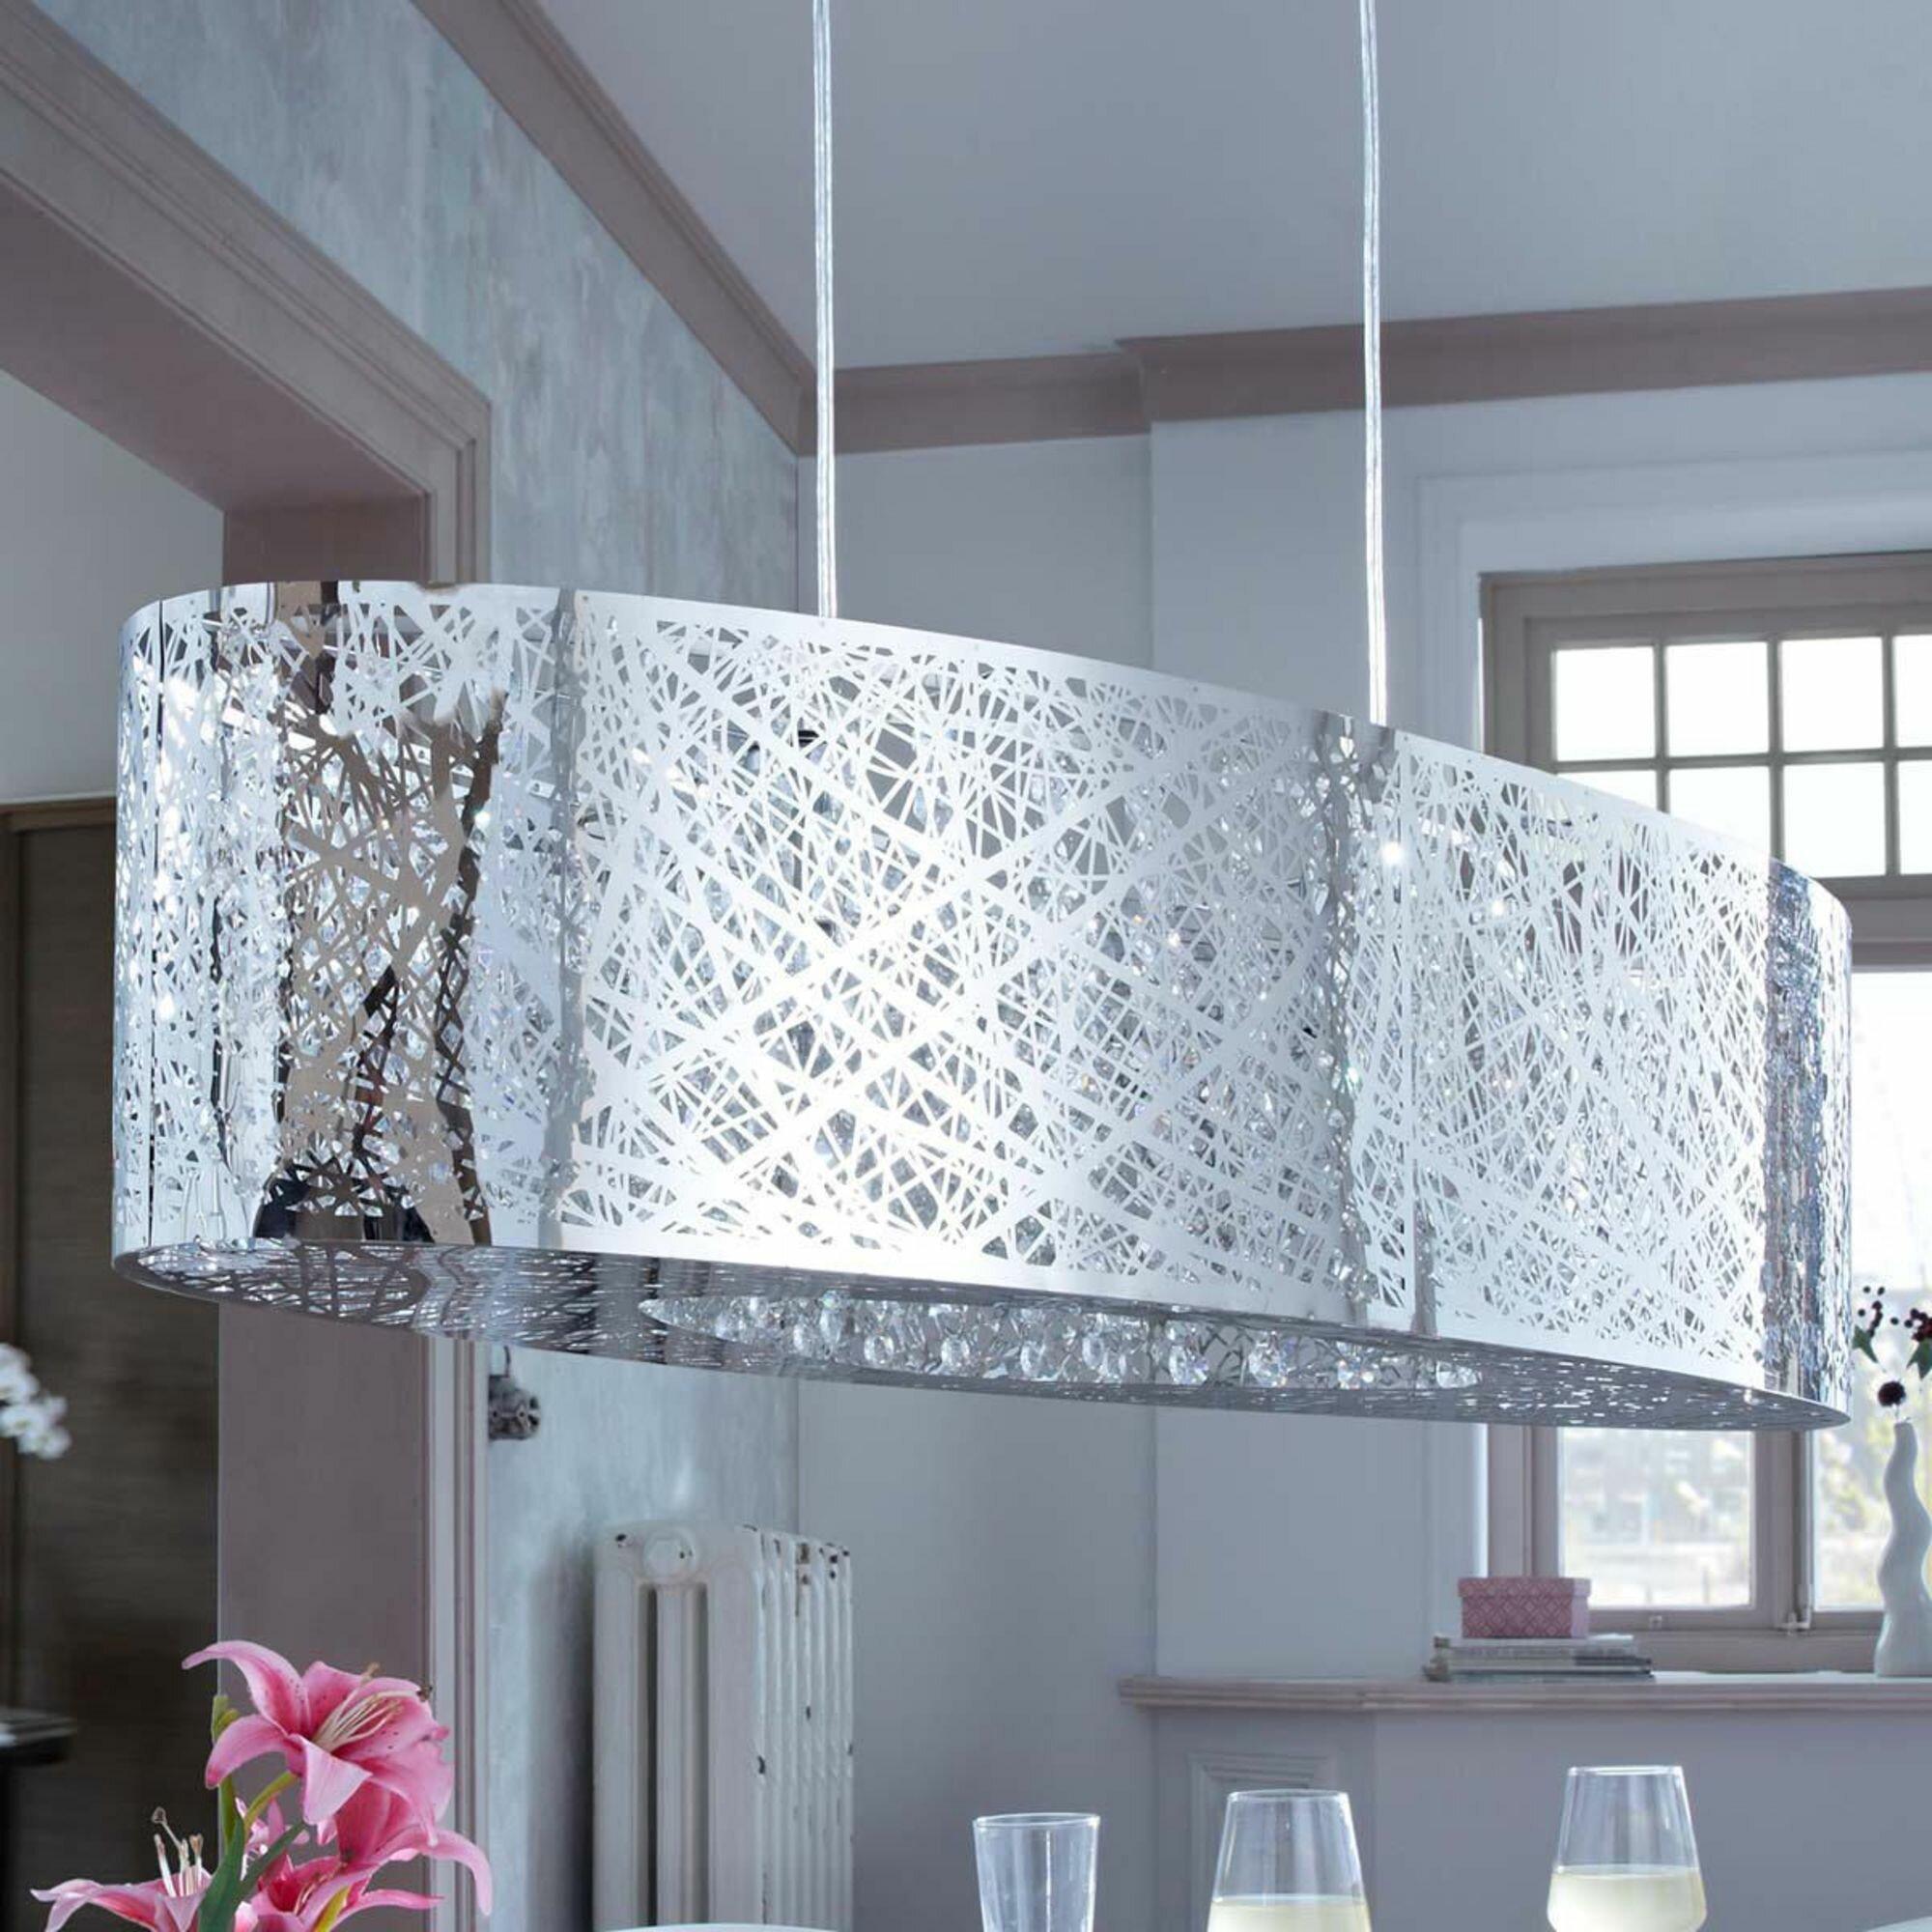 pureday kristall pendelleuchte 2 flammig grate bewertungen. Black Bedroom Furniture Sets. Home Design Ideas